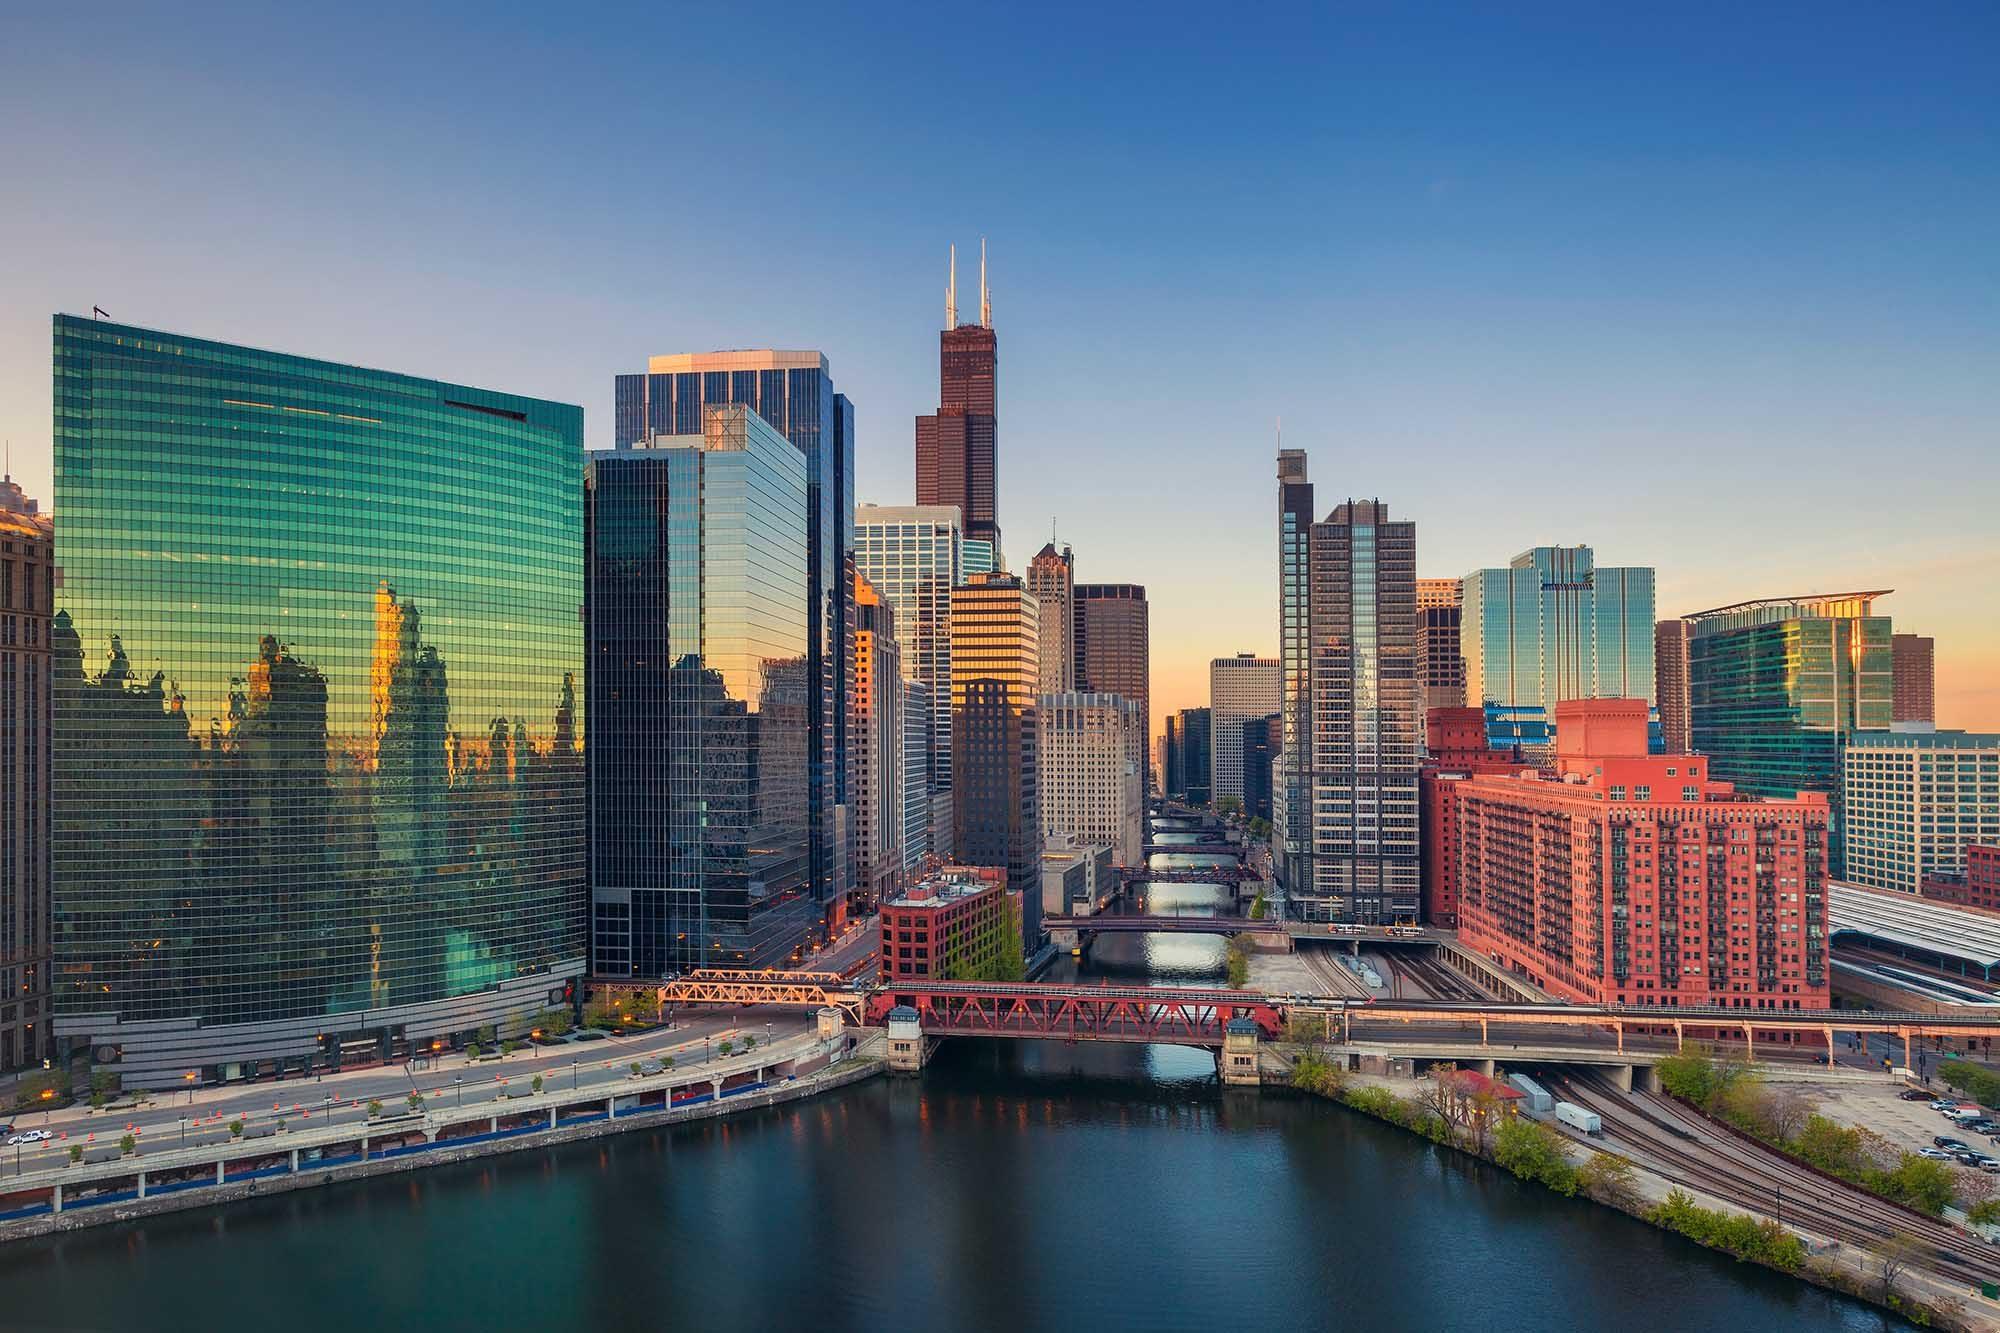 Sold E Chicago